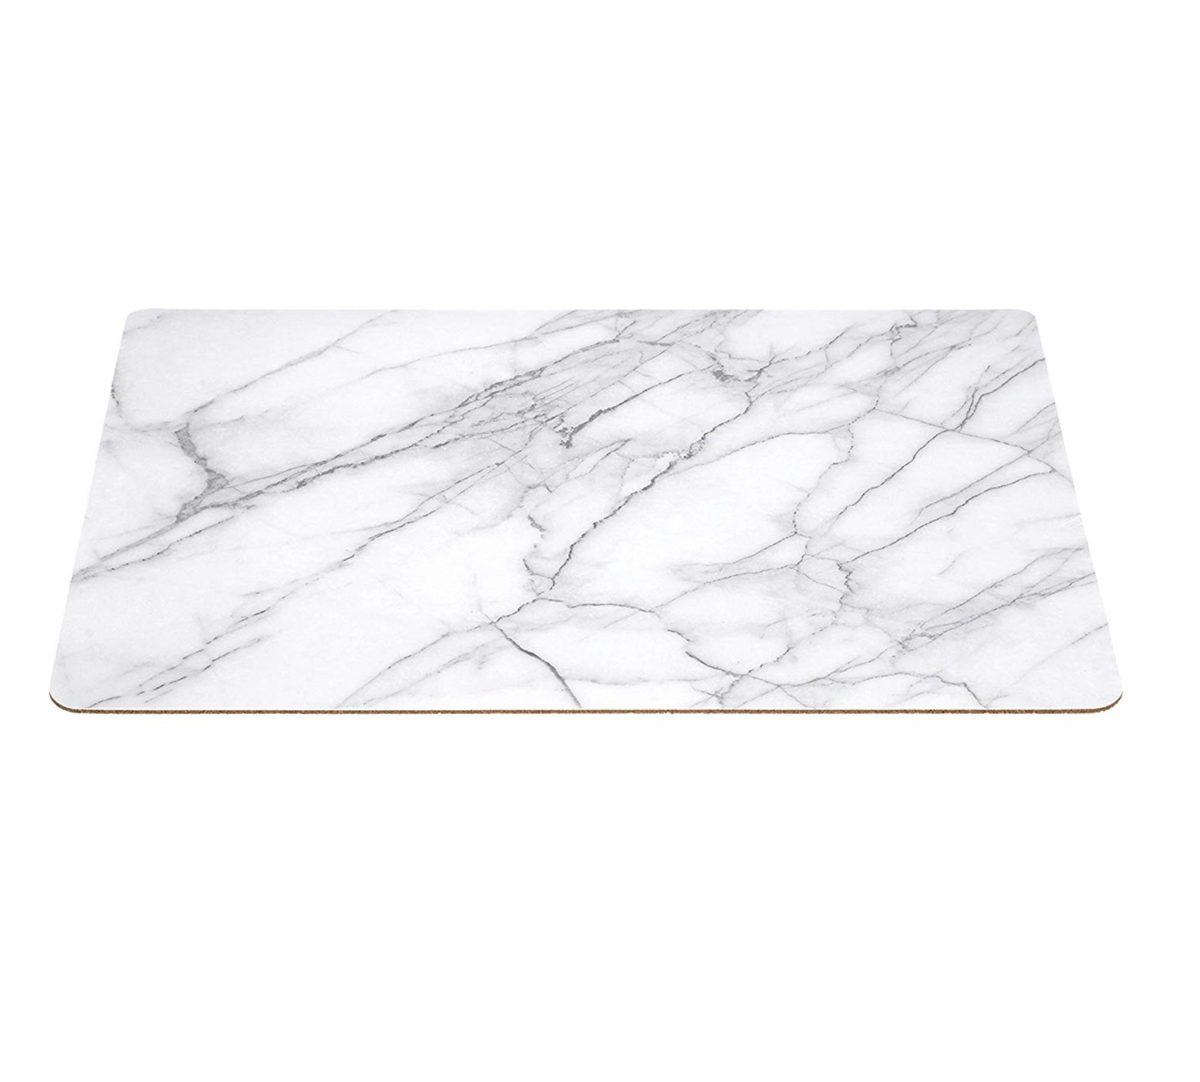 71LWRkphy3L. SL1500  1200x1082 - Placemat cork marblelook (L079747)